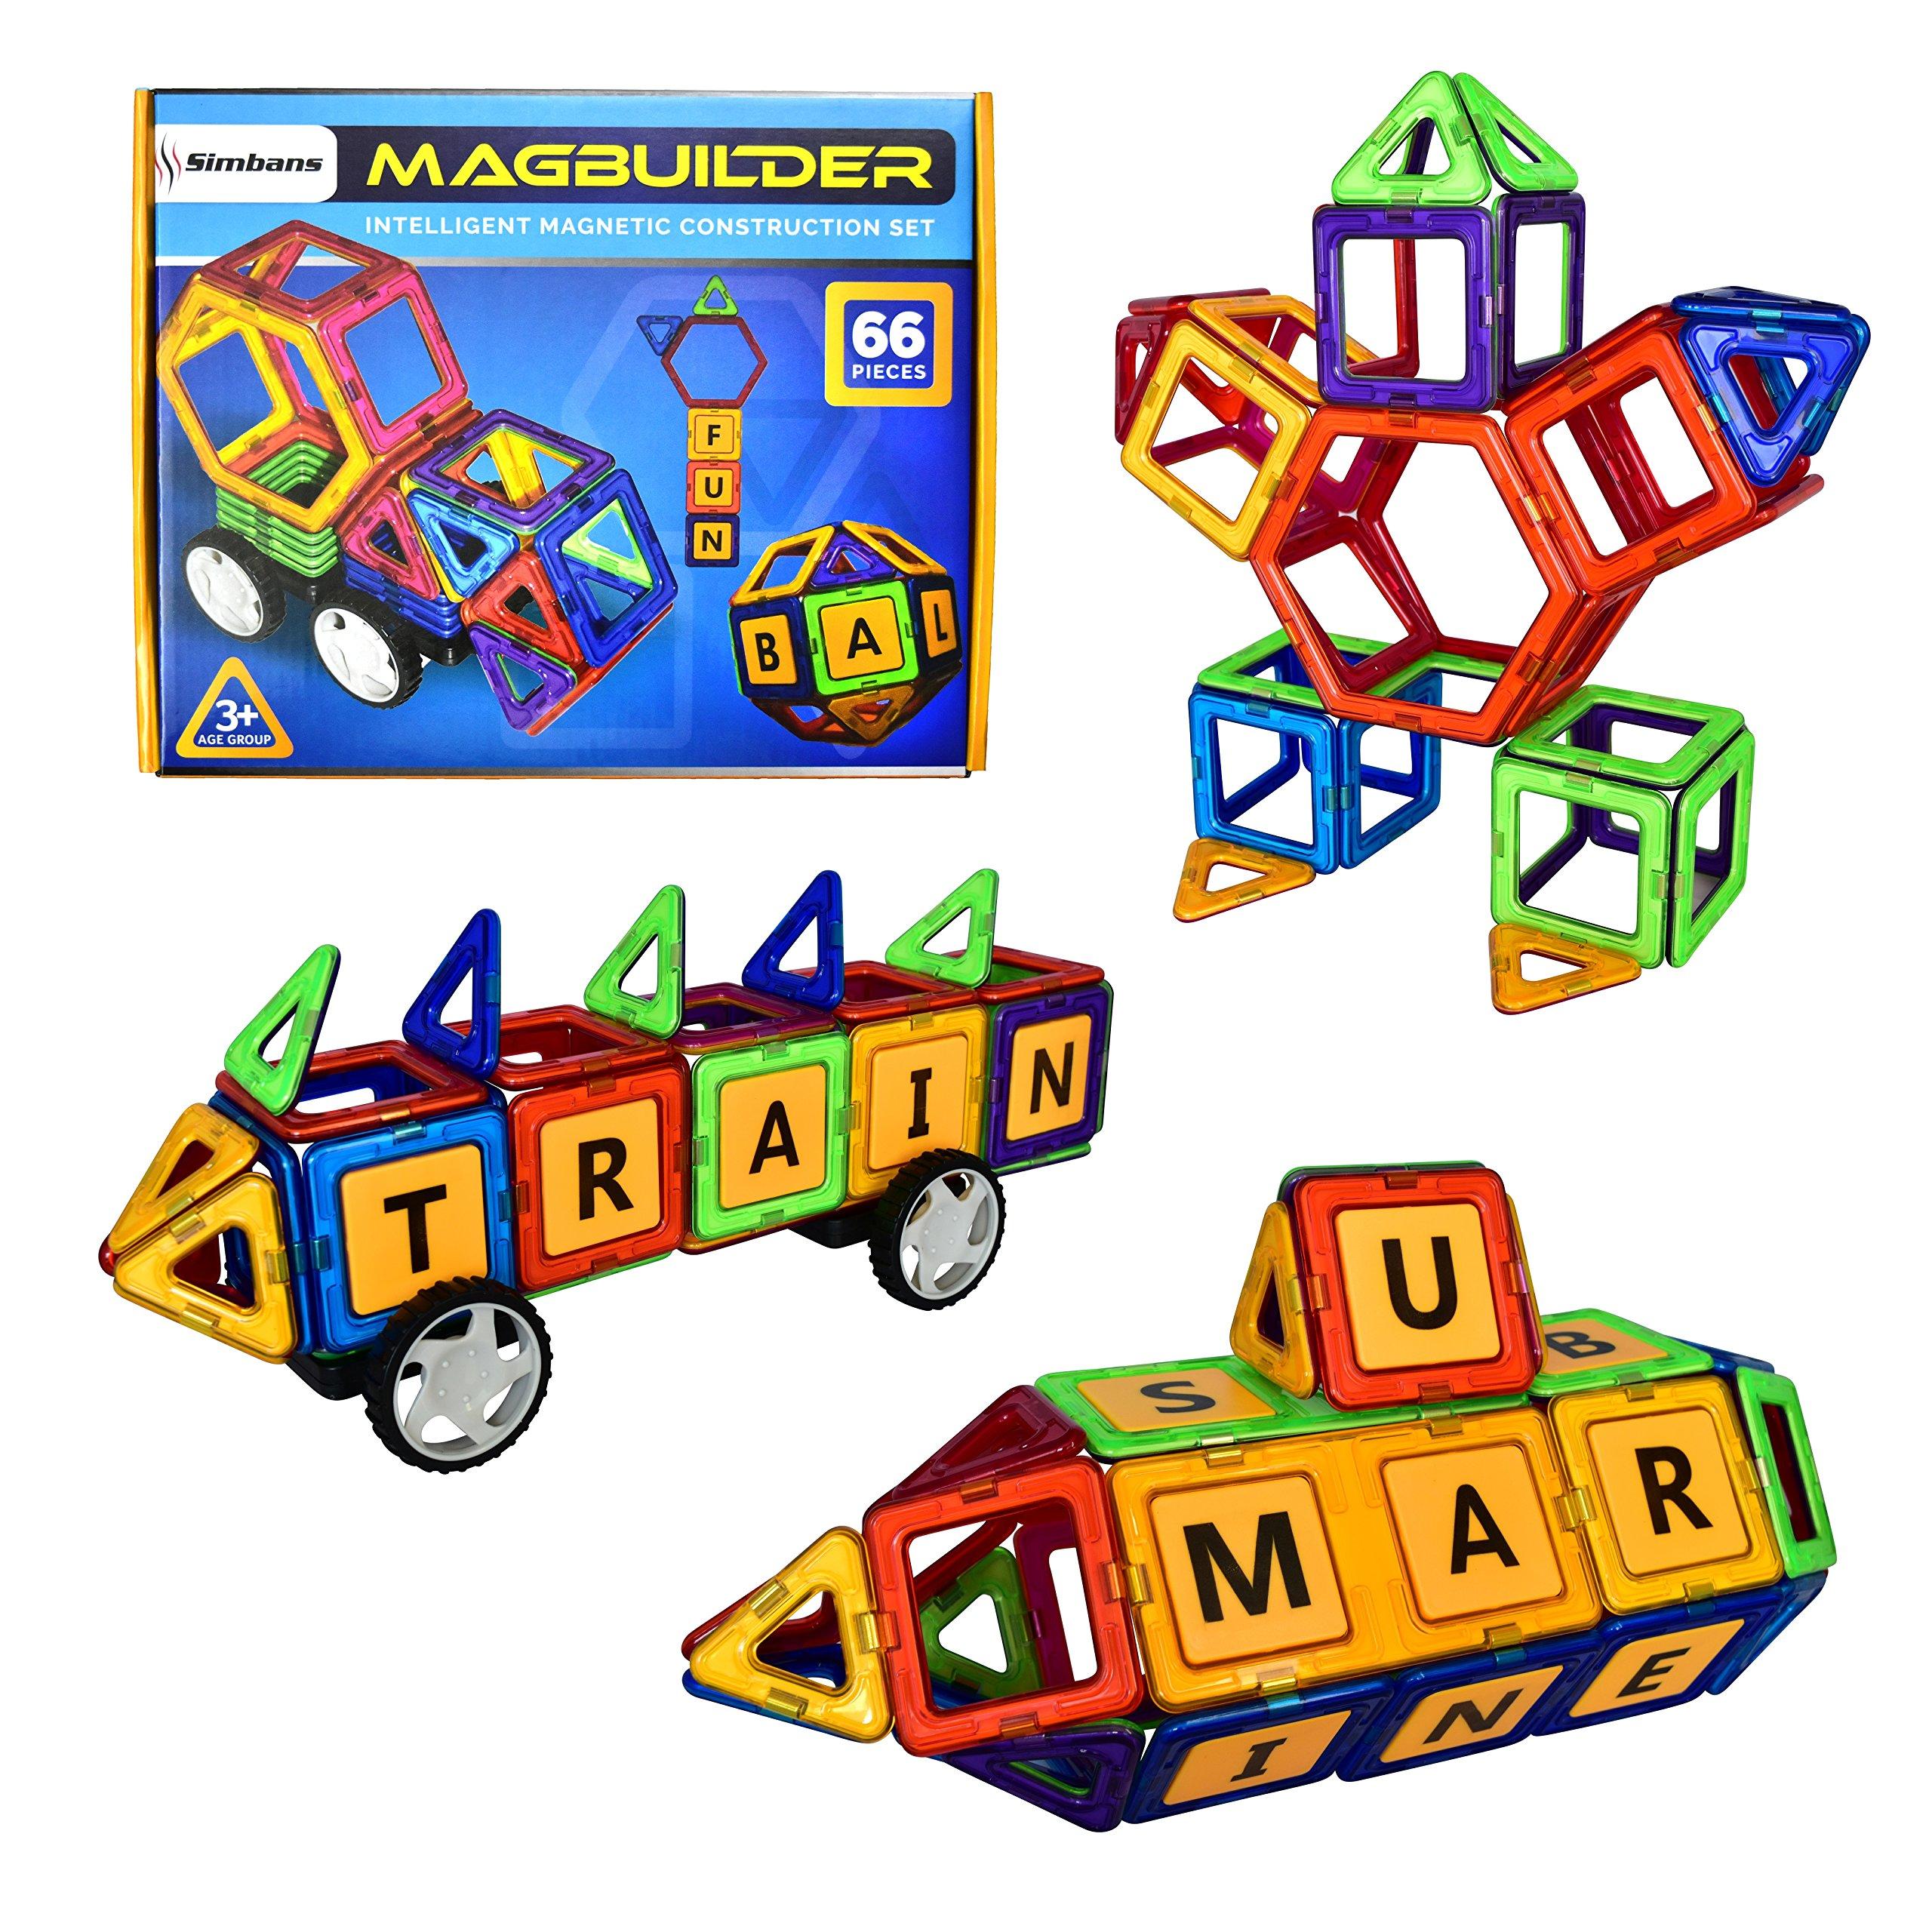 MAGBUILDER 66 Pieces Magnetic Blocks Toy